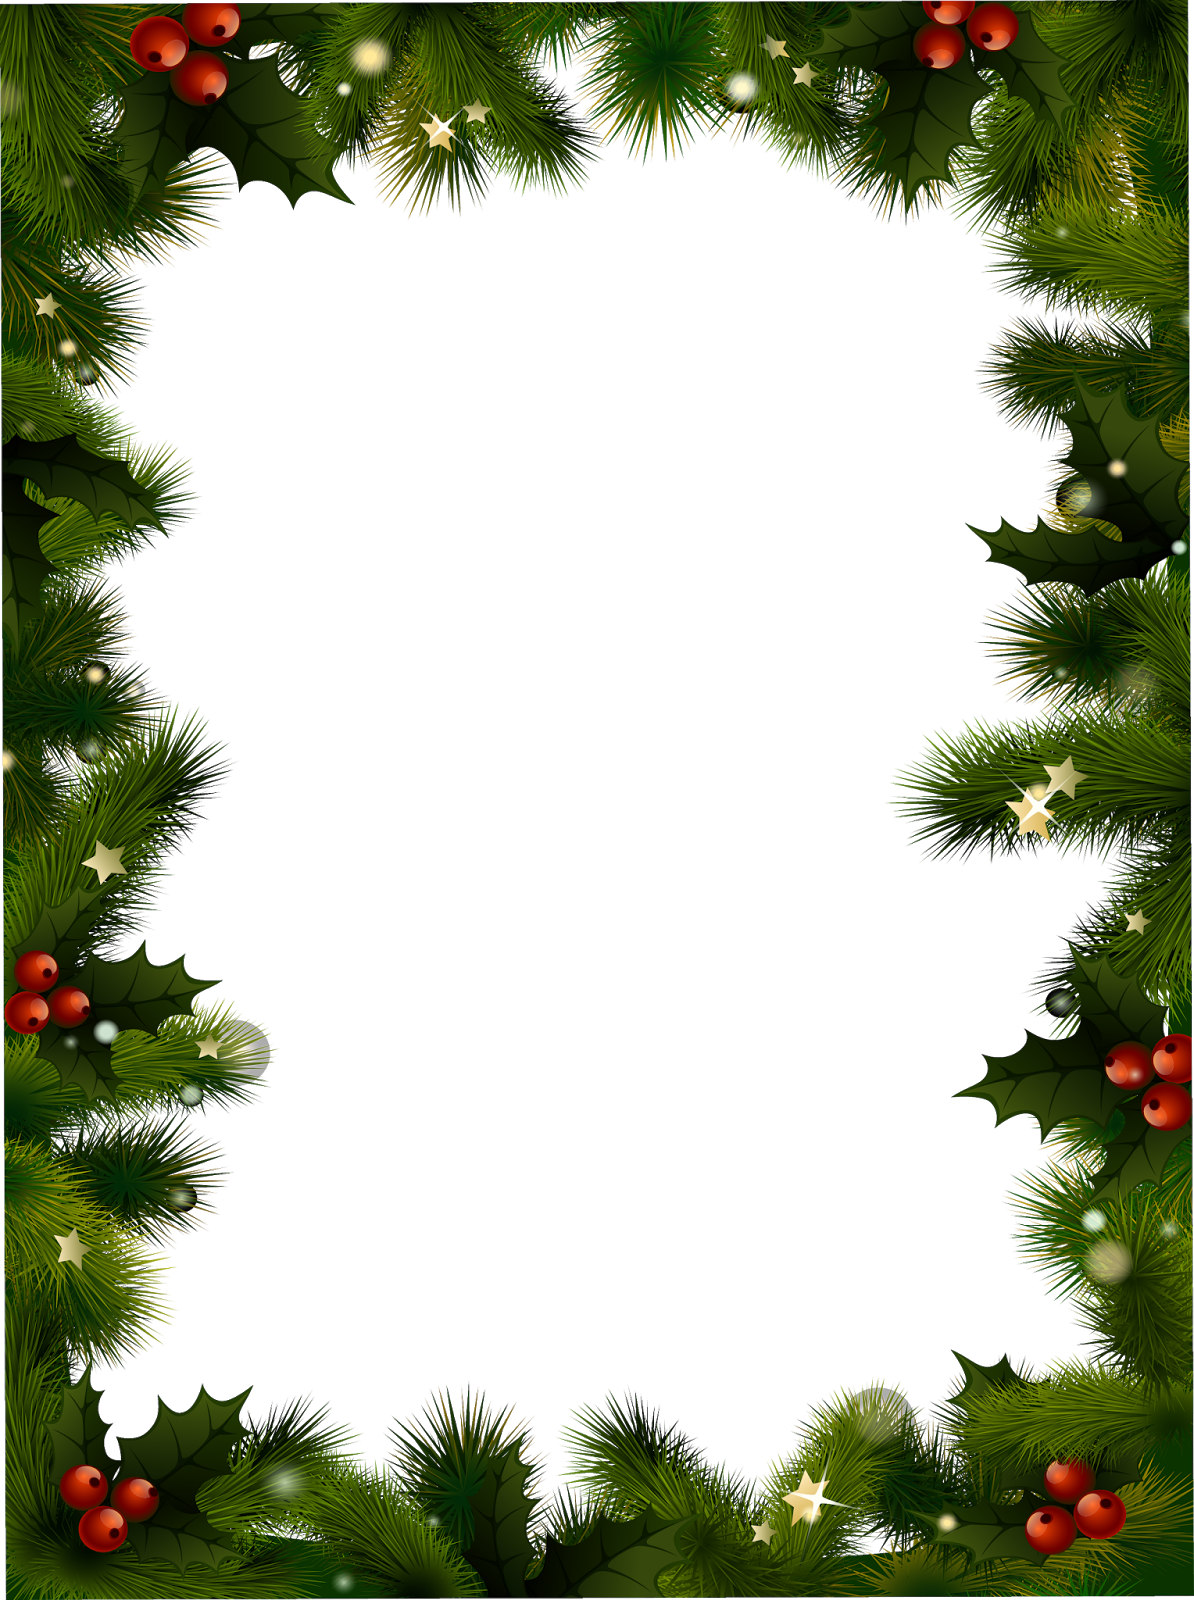 Christmas background clipart free picture freeuse library Pin by Majka Liptakova on Etikety | Pinterest | Christmas border ... picture freeuse library